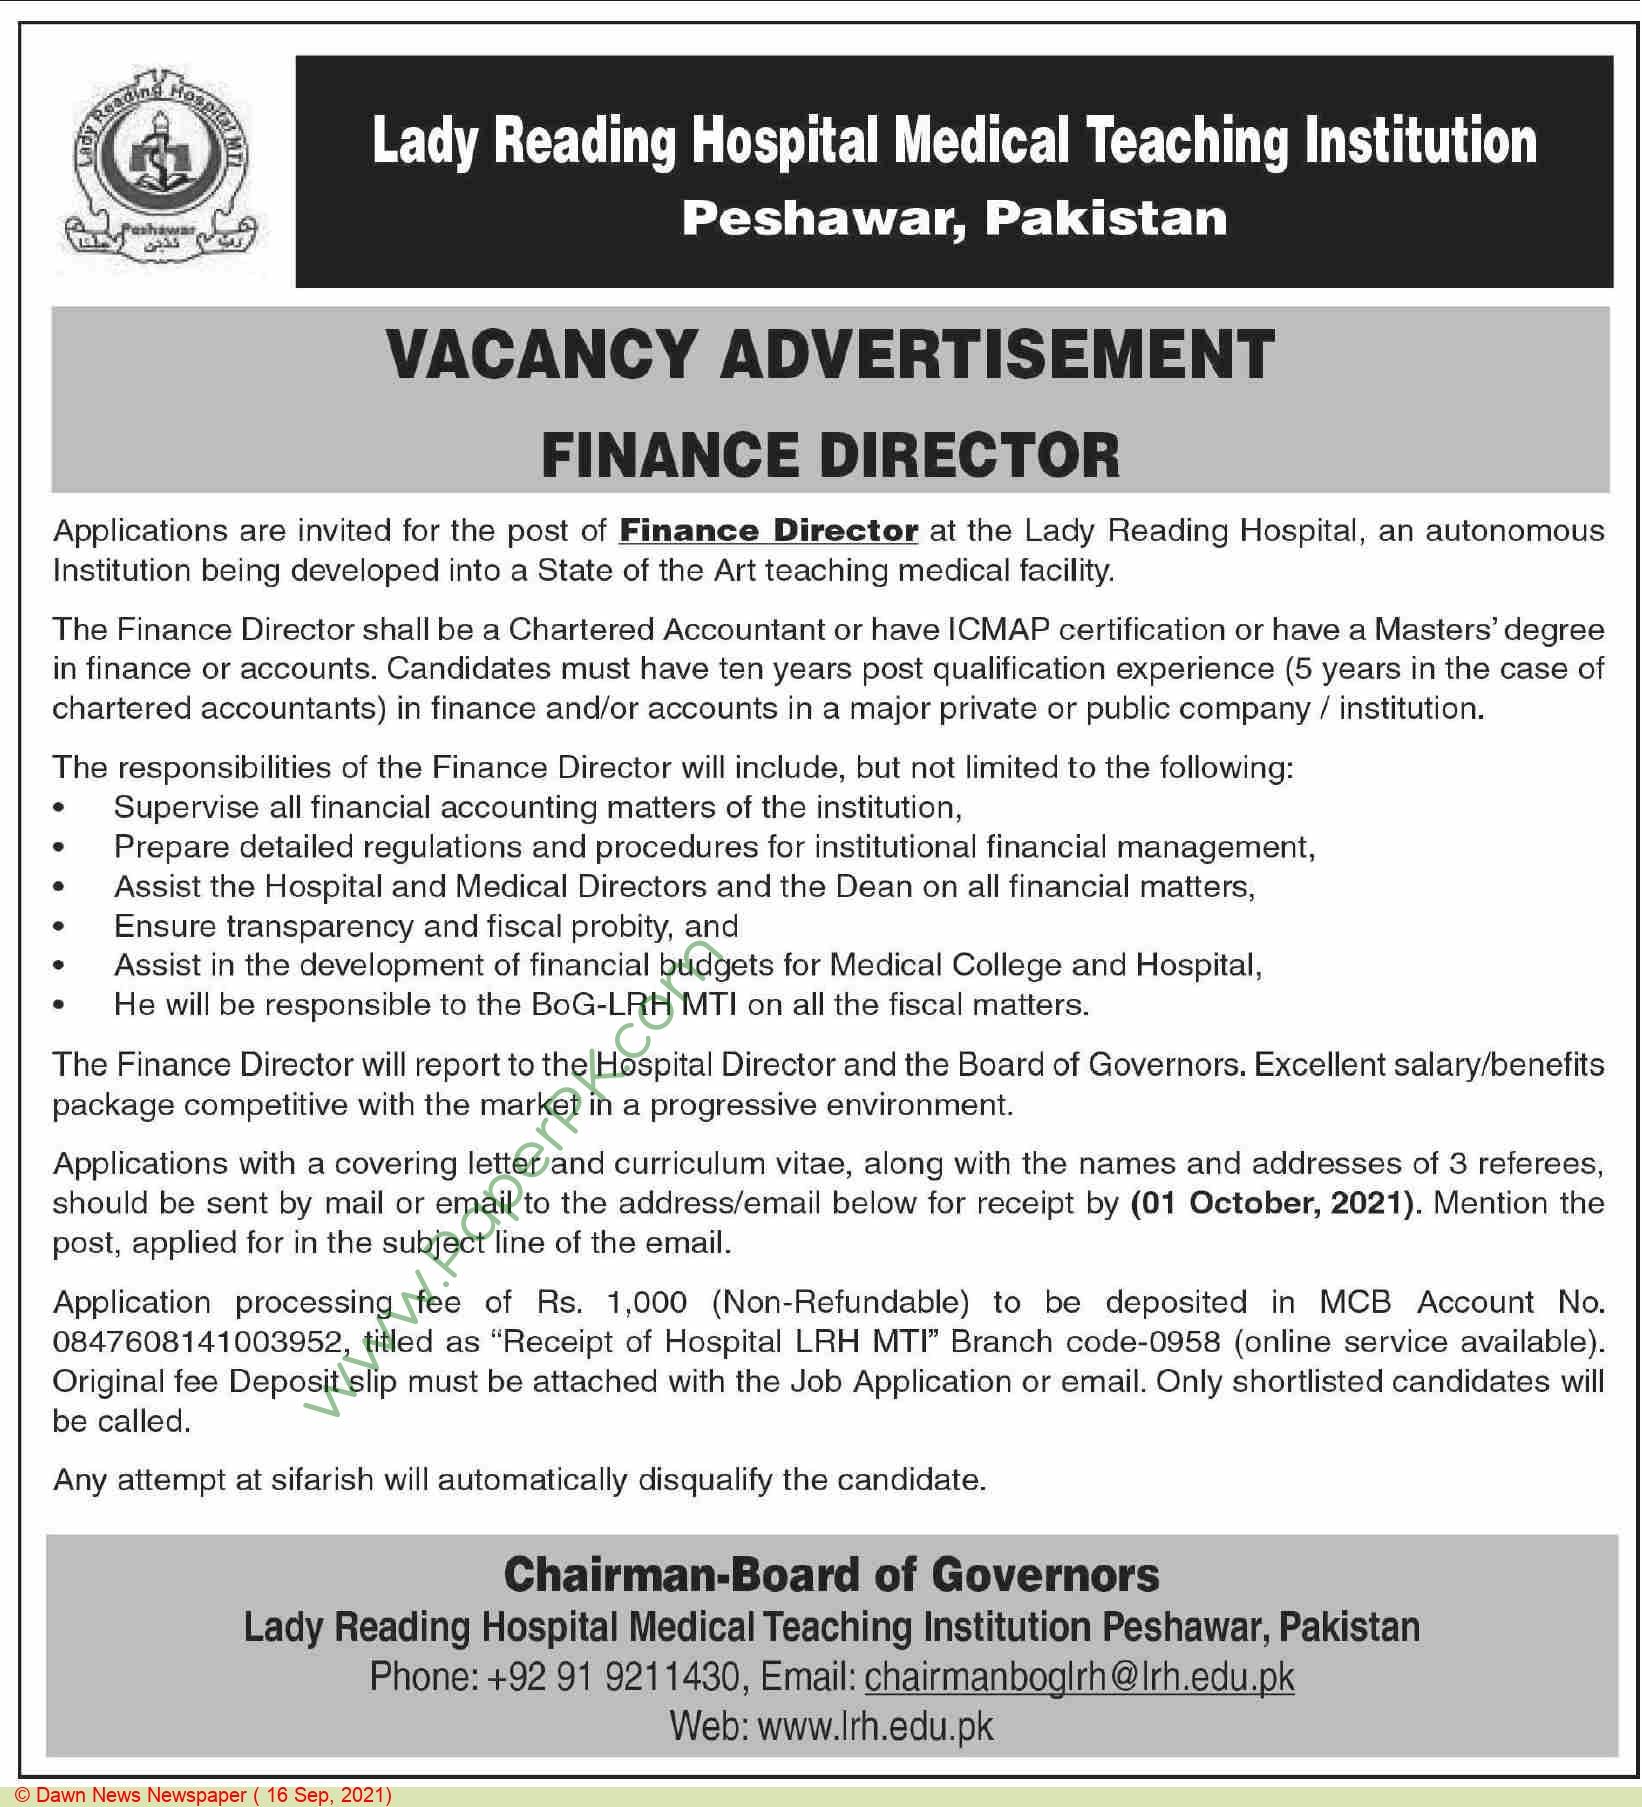 Lady Reading Hospital Peshawar Jobs For Finance Director advertisemet in newspaper on September 16,2021